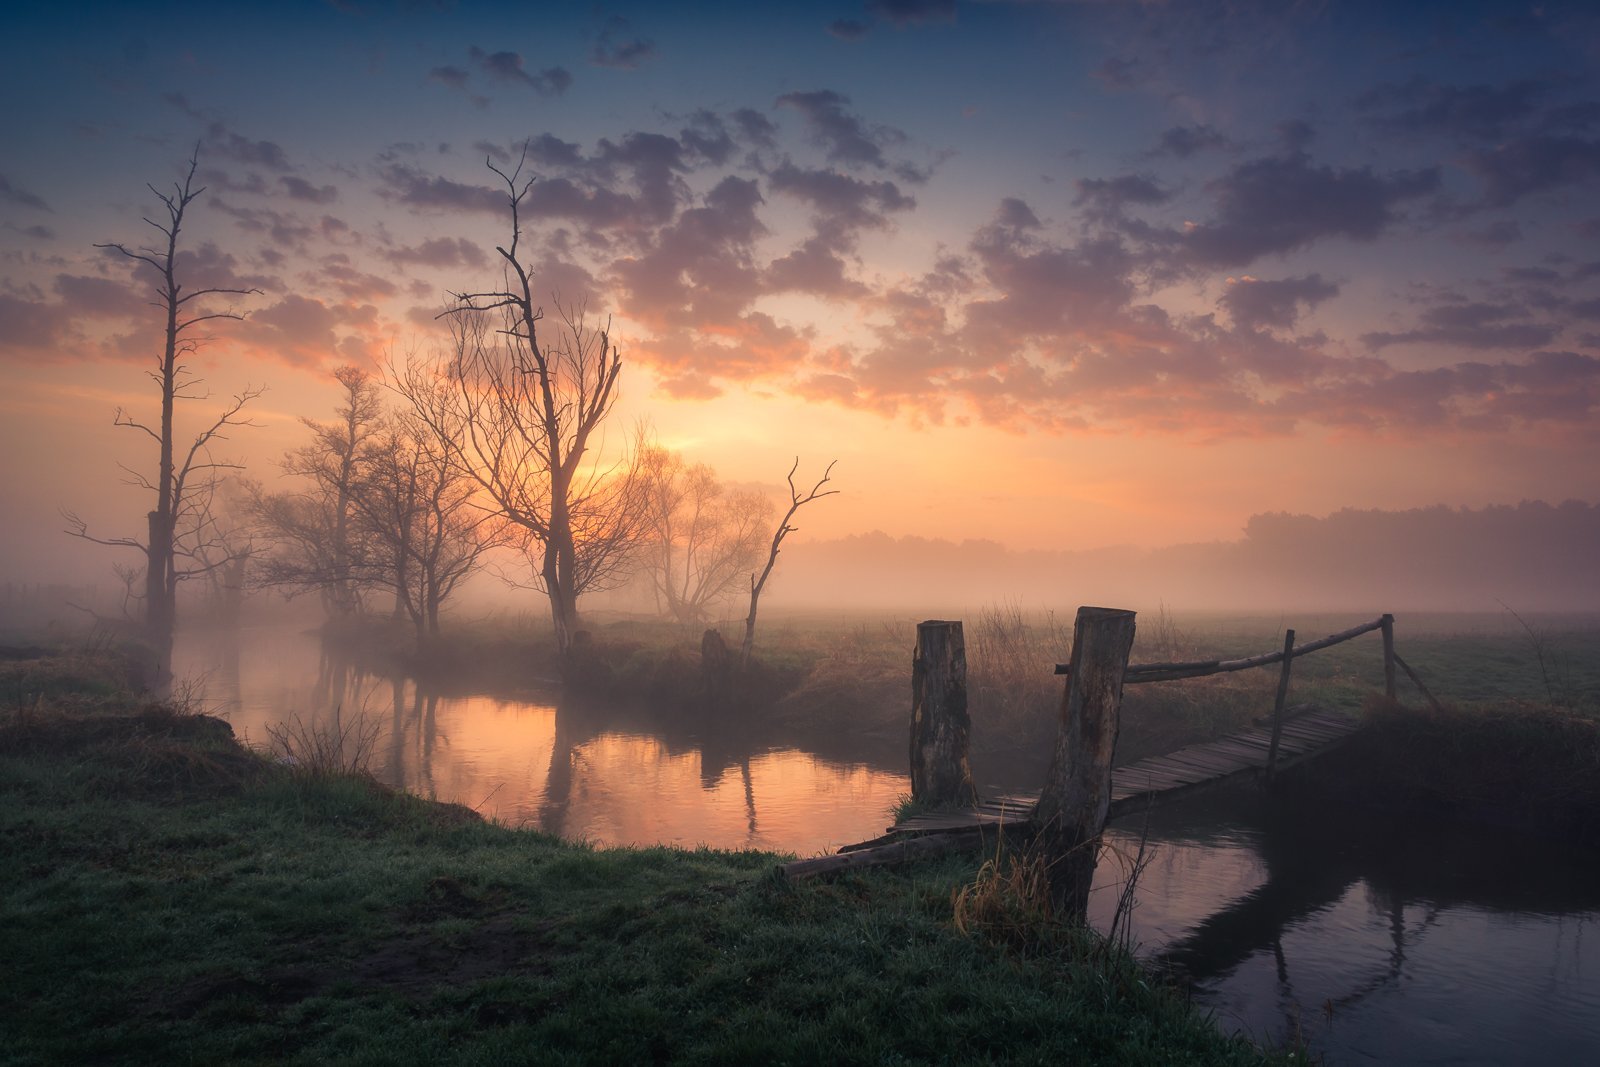 jeziorka, river, morning, sunrise, spring, wooden, bridge, , Bociarski Artur